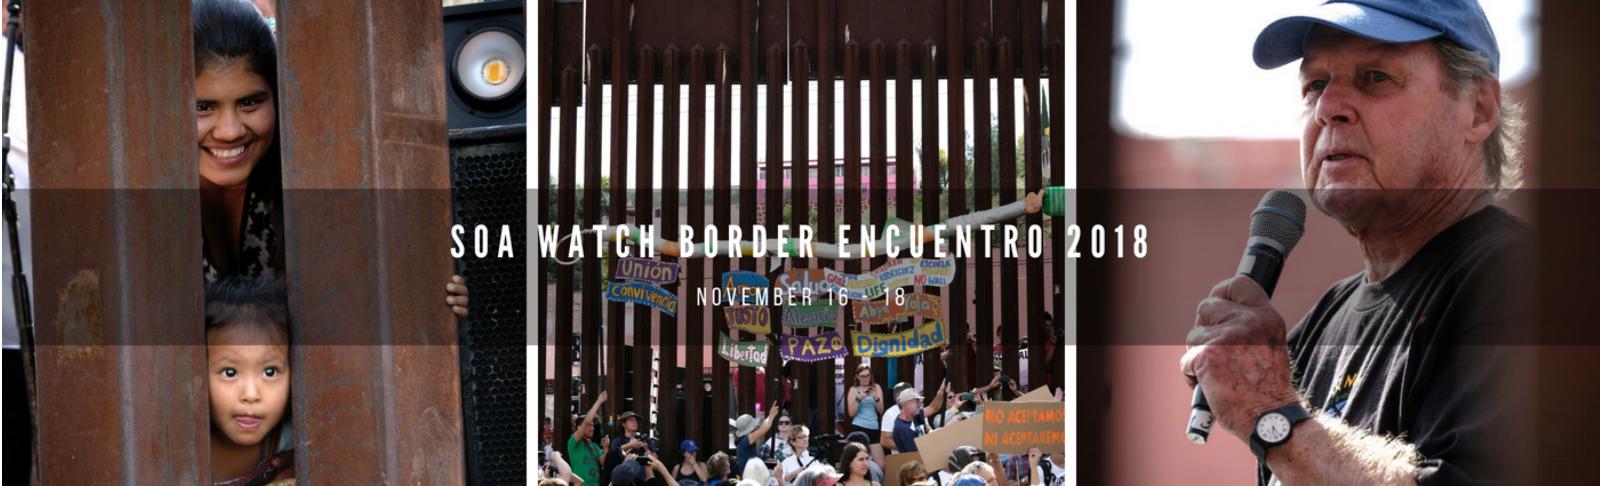 StevePavey-BorderEncuentro-header.png